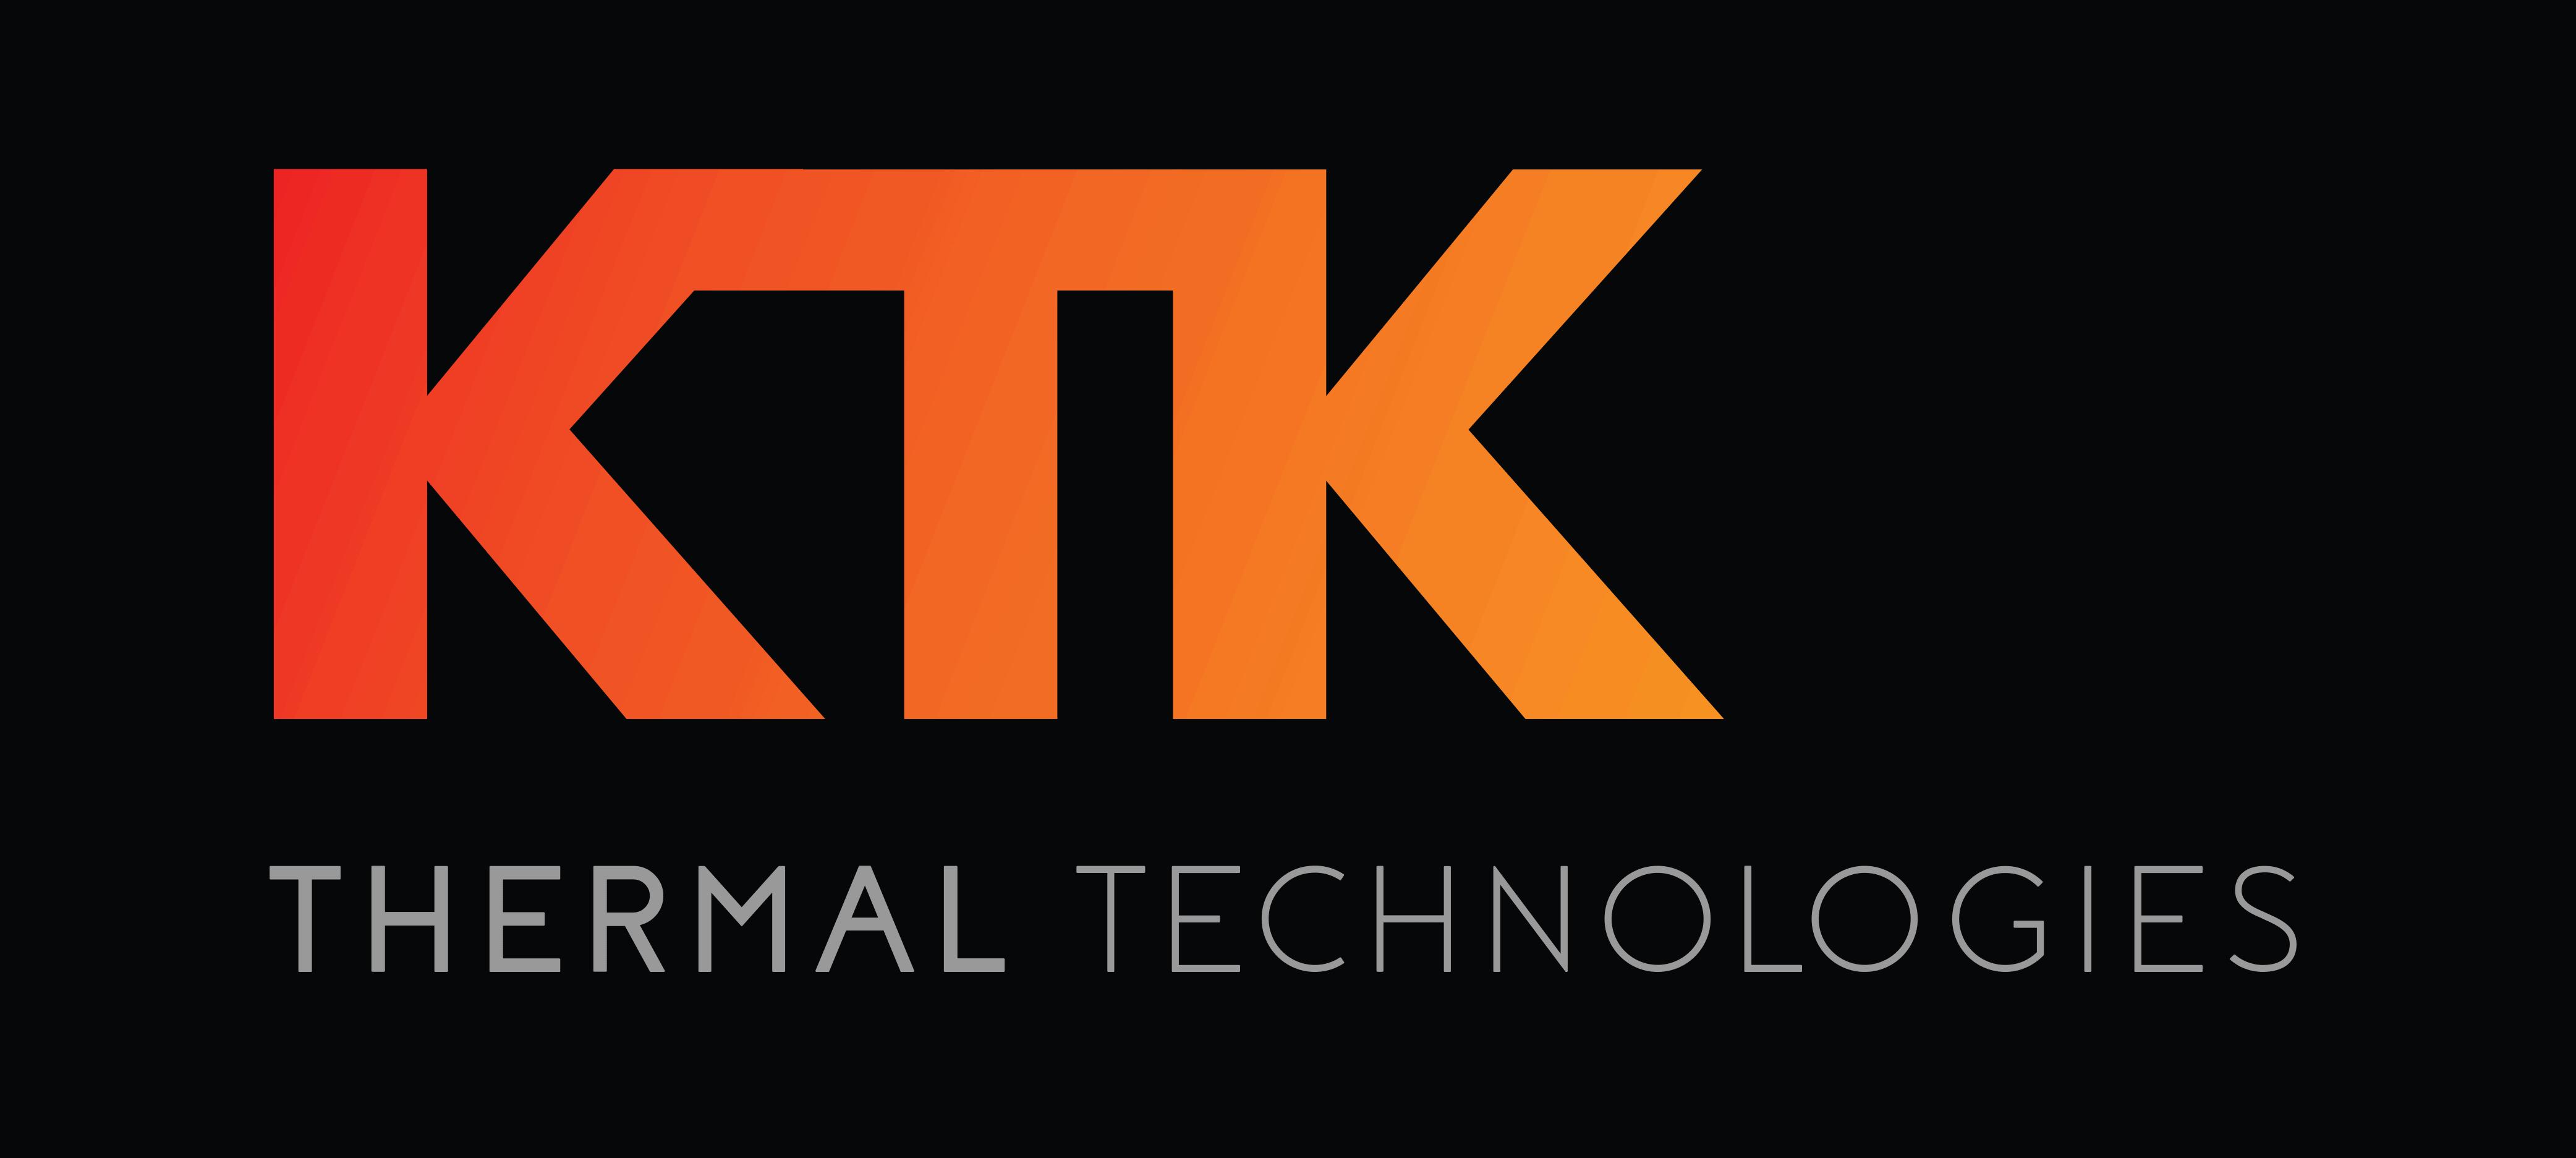 Sales Support For KTK